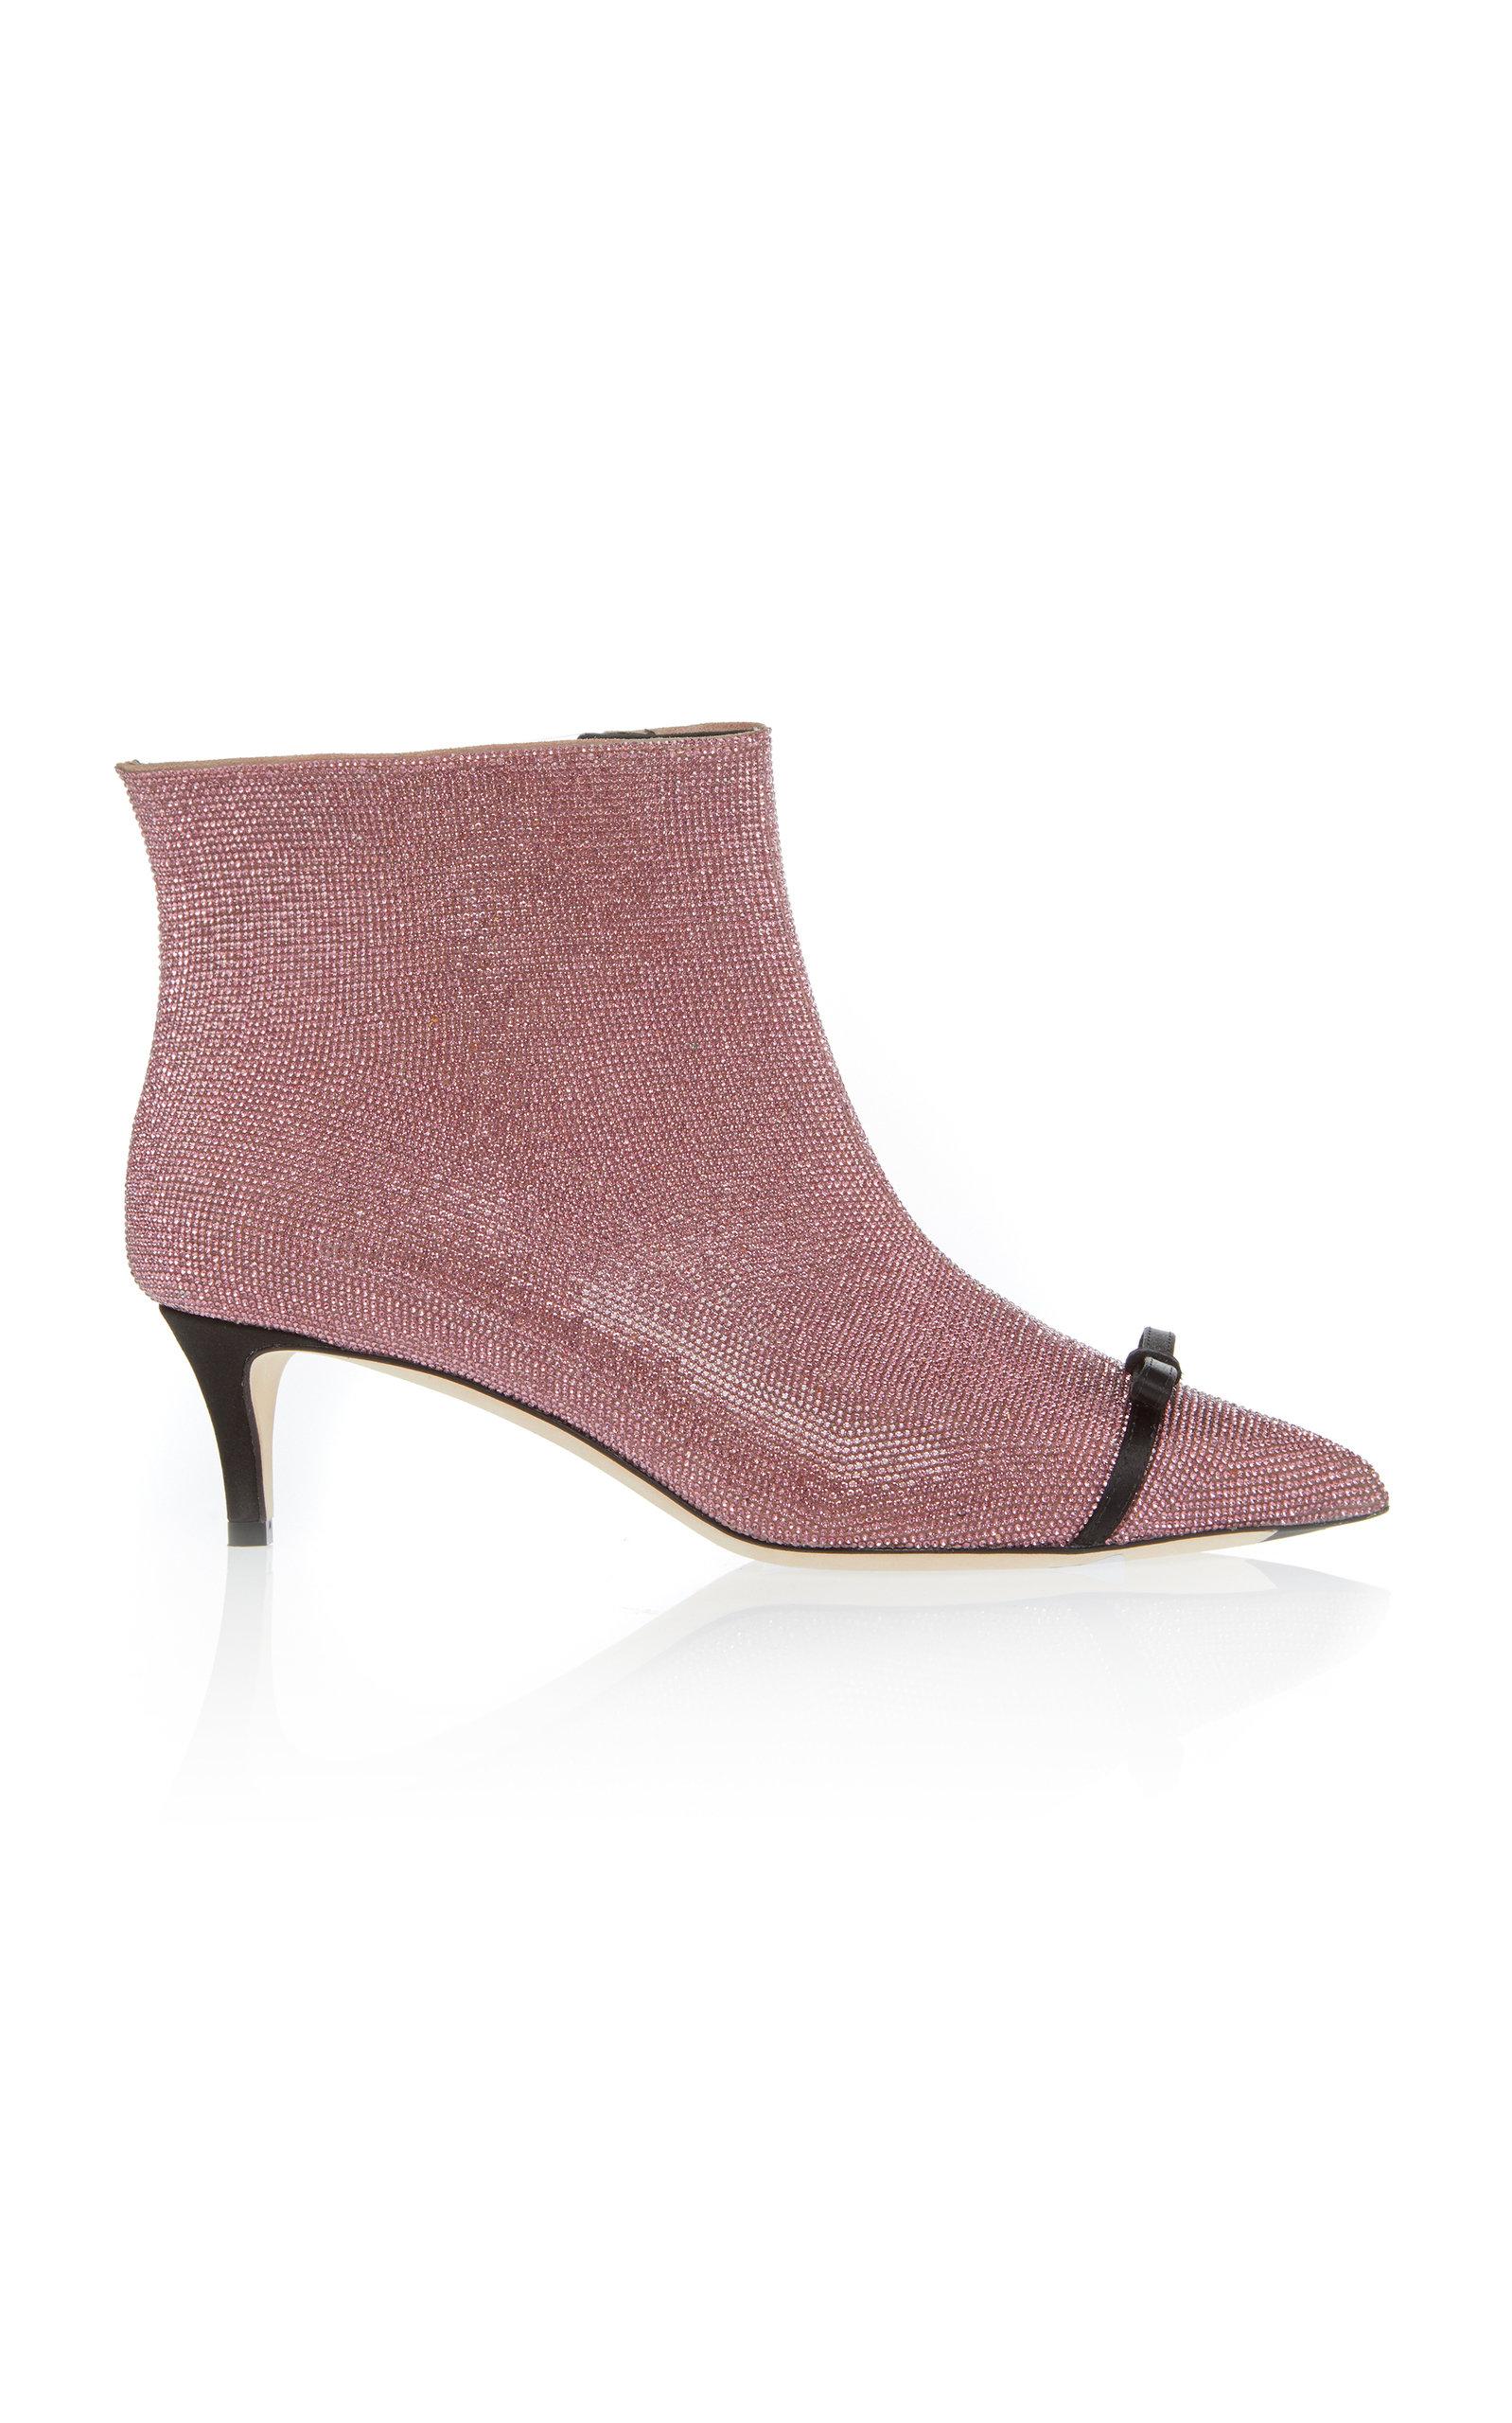 Crystal-Embellished Ankle Boots, Purple